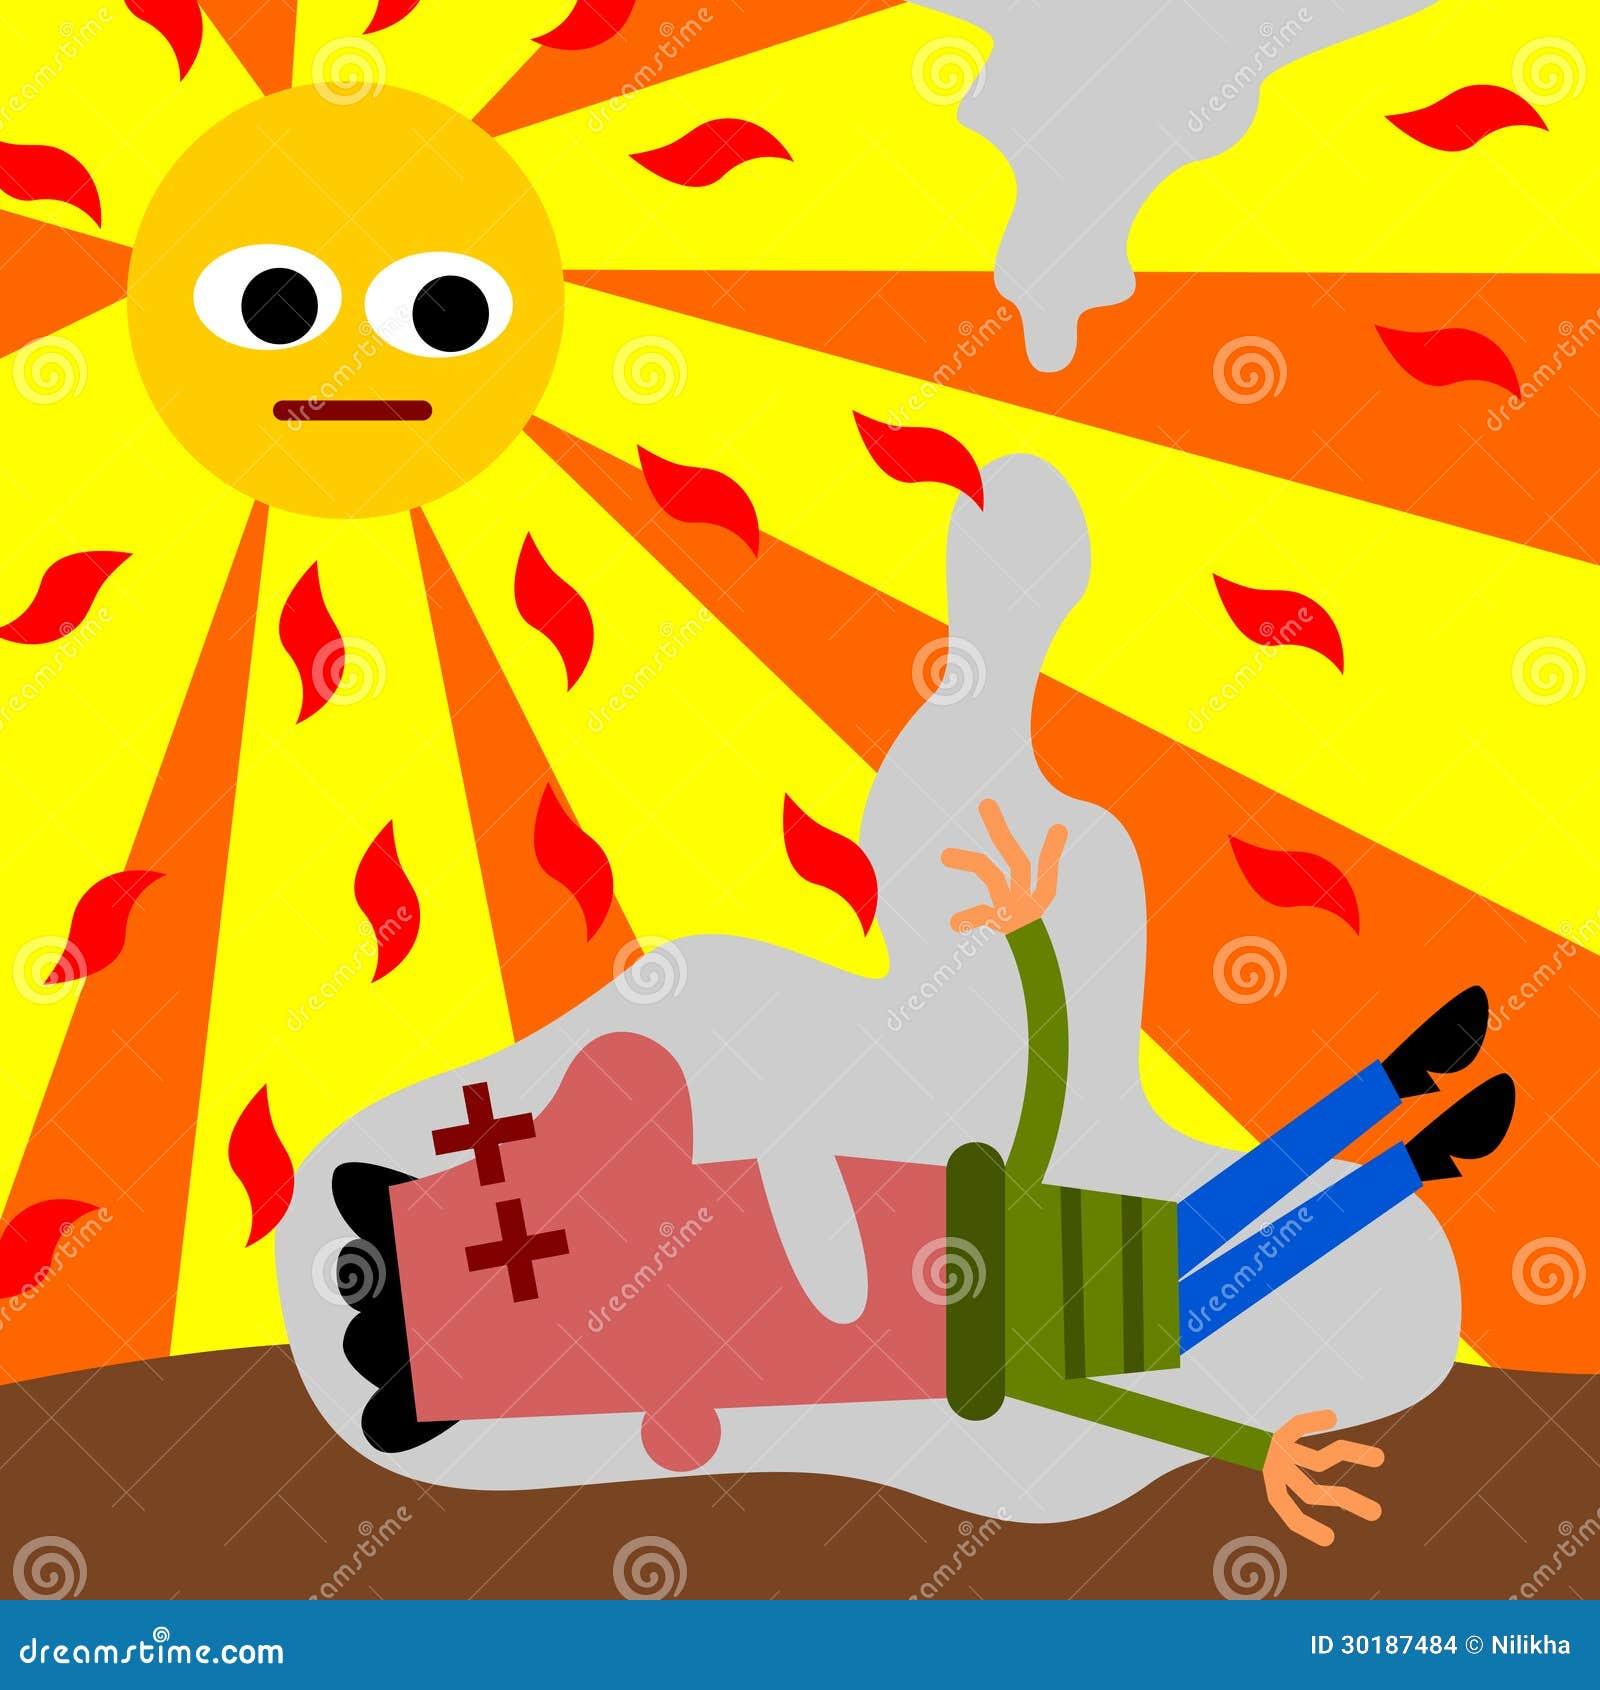 heat illness prevention plan pdf